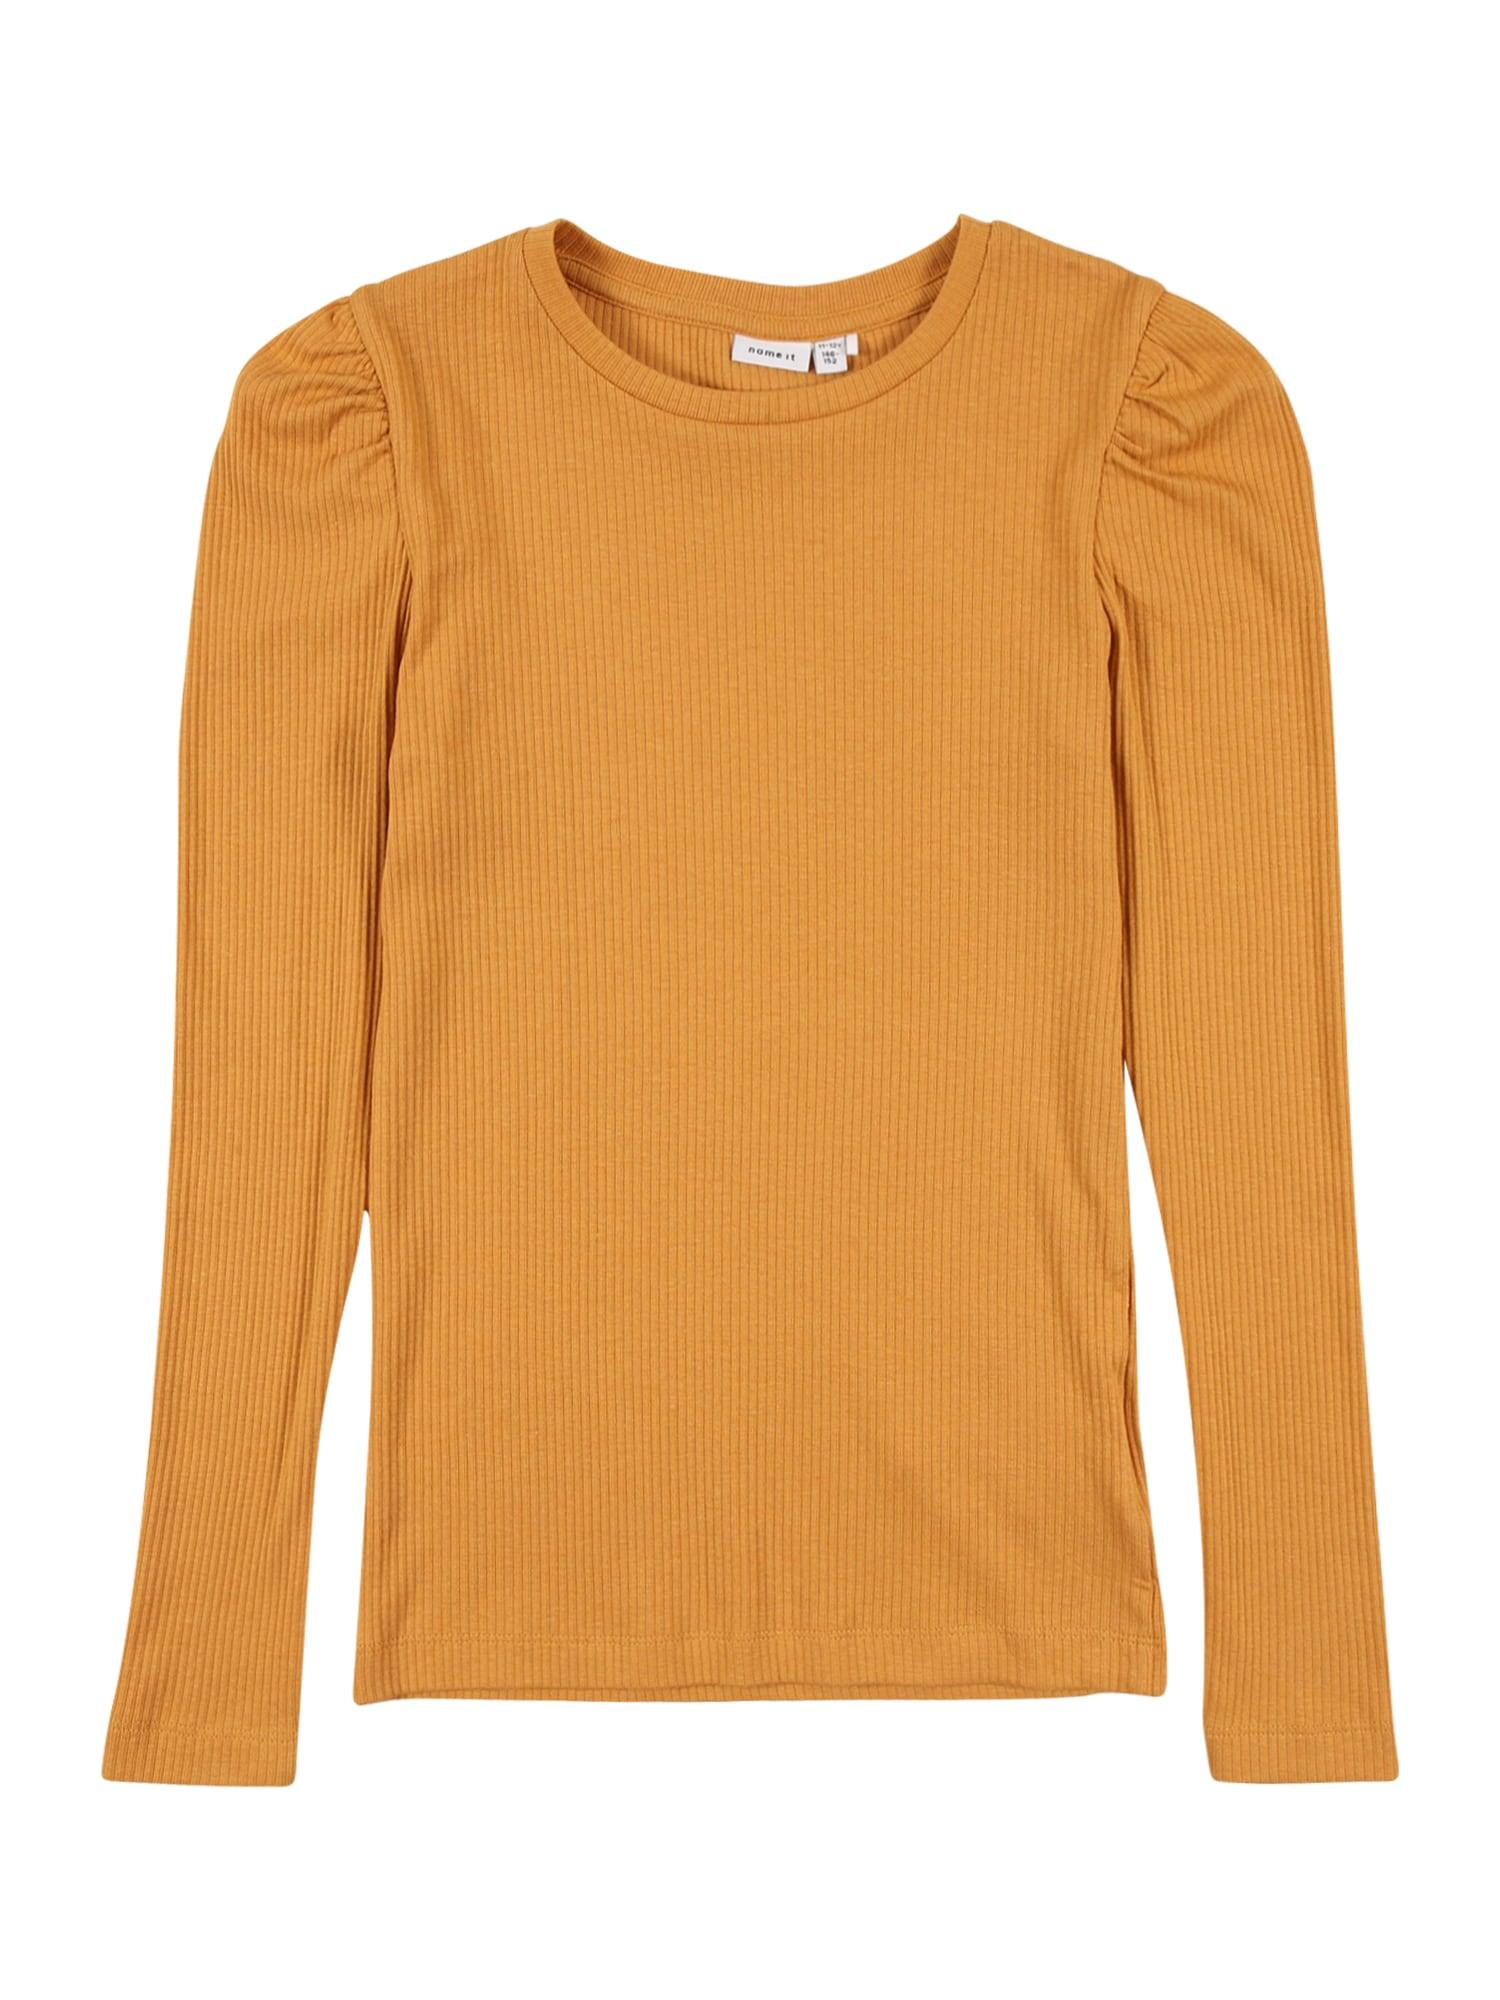 NAME IT Tričko 'KABEXI'  zlatě žlutá